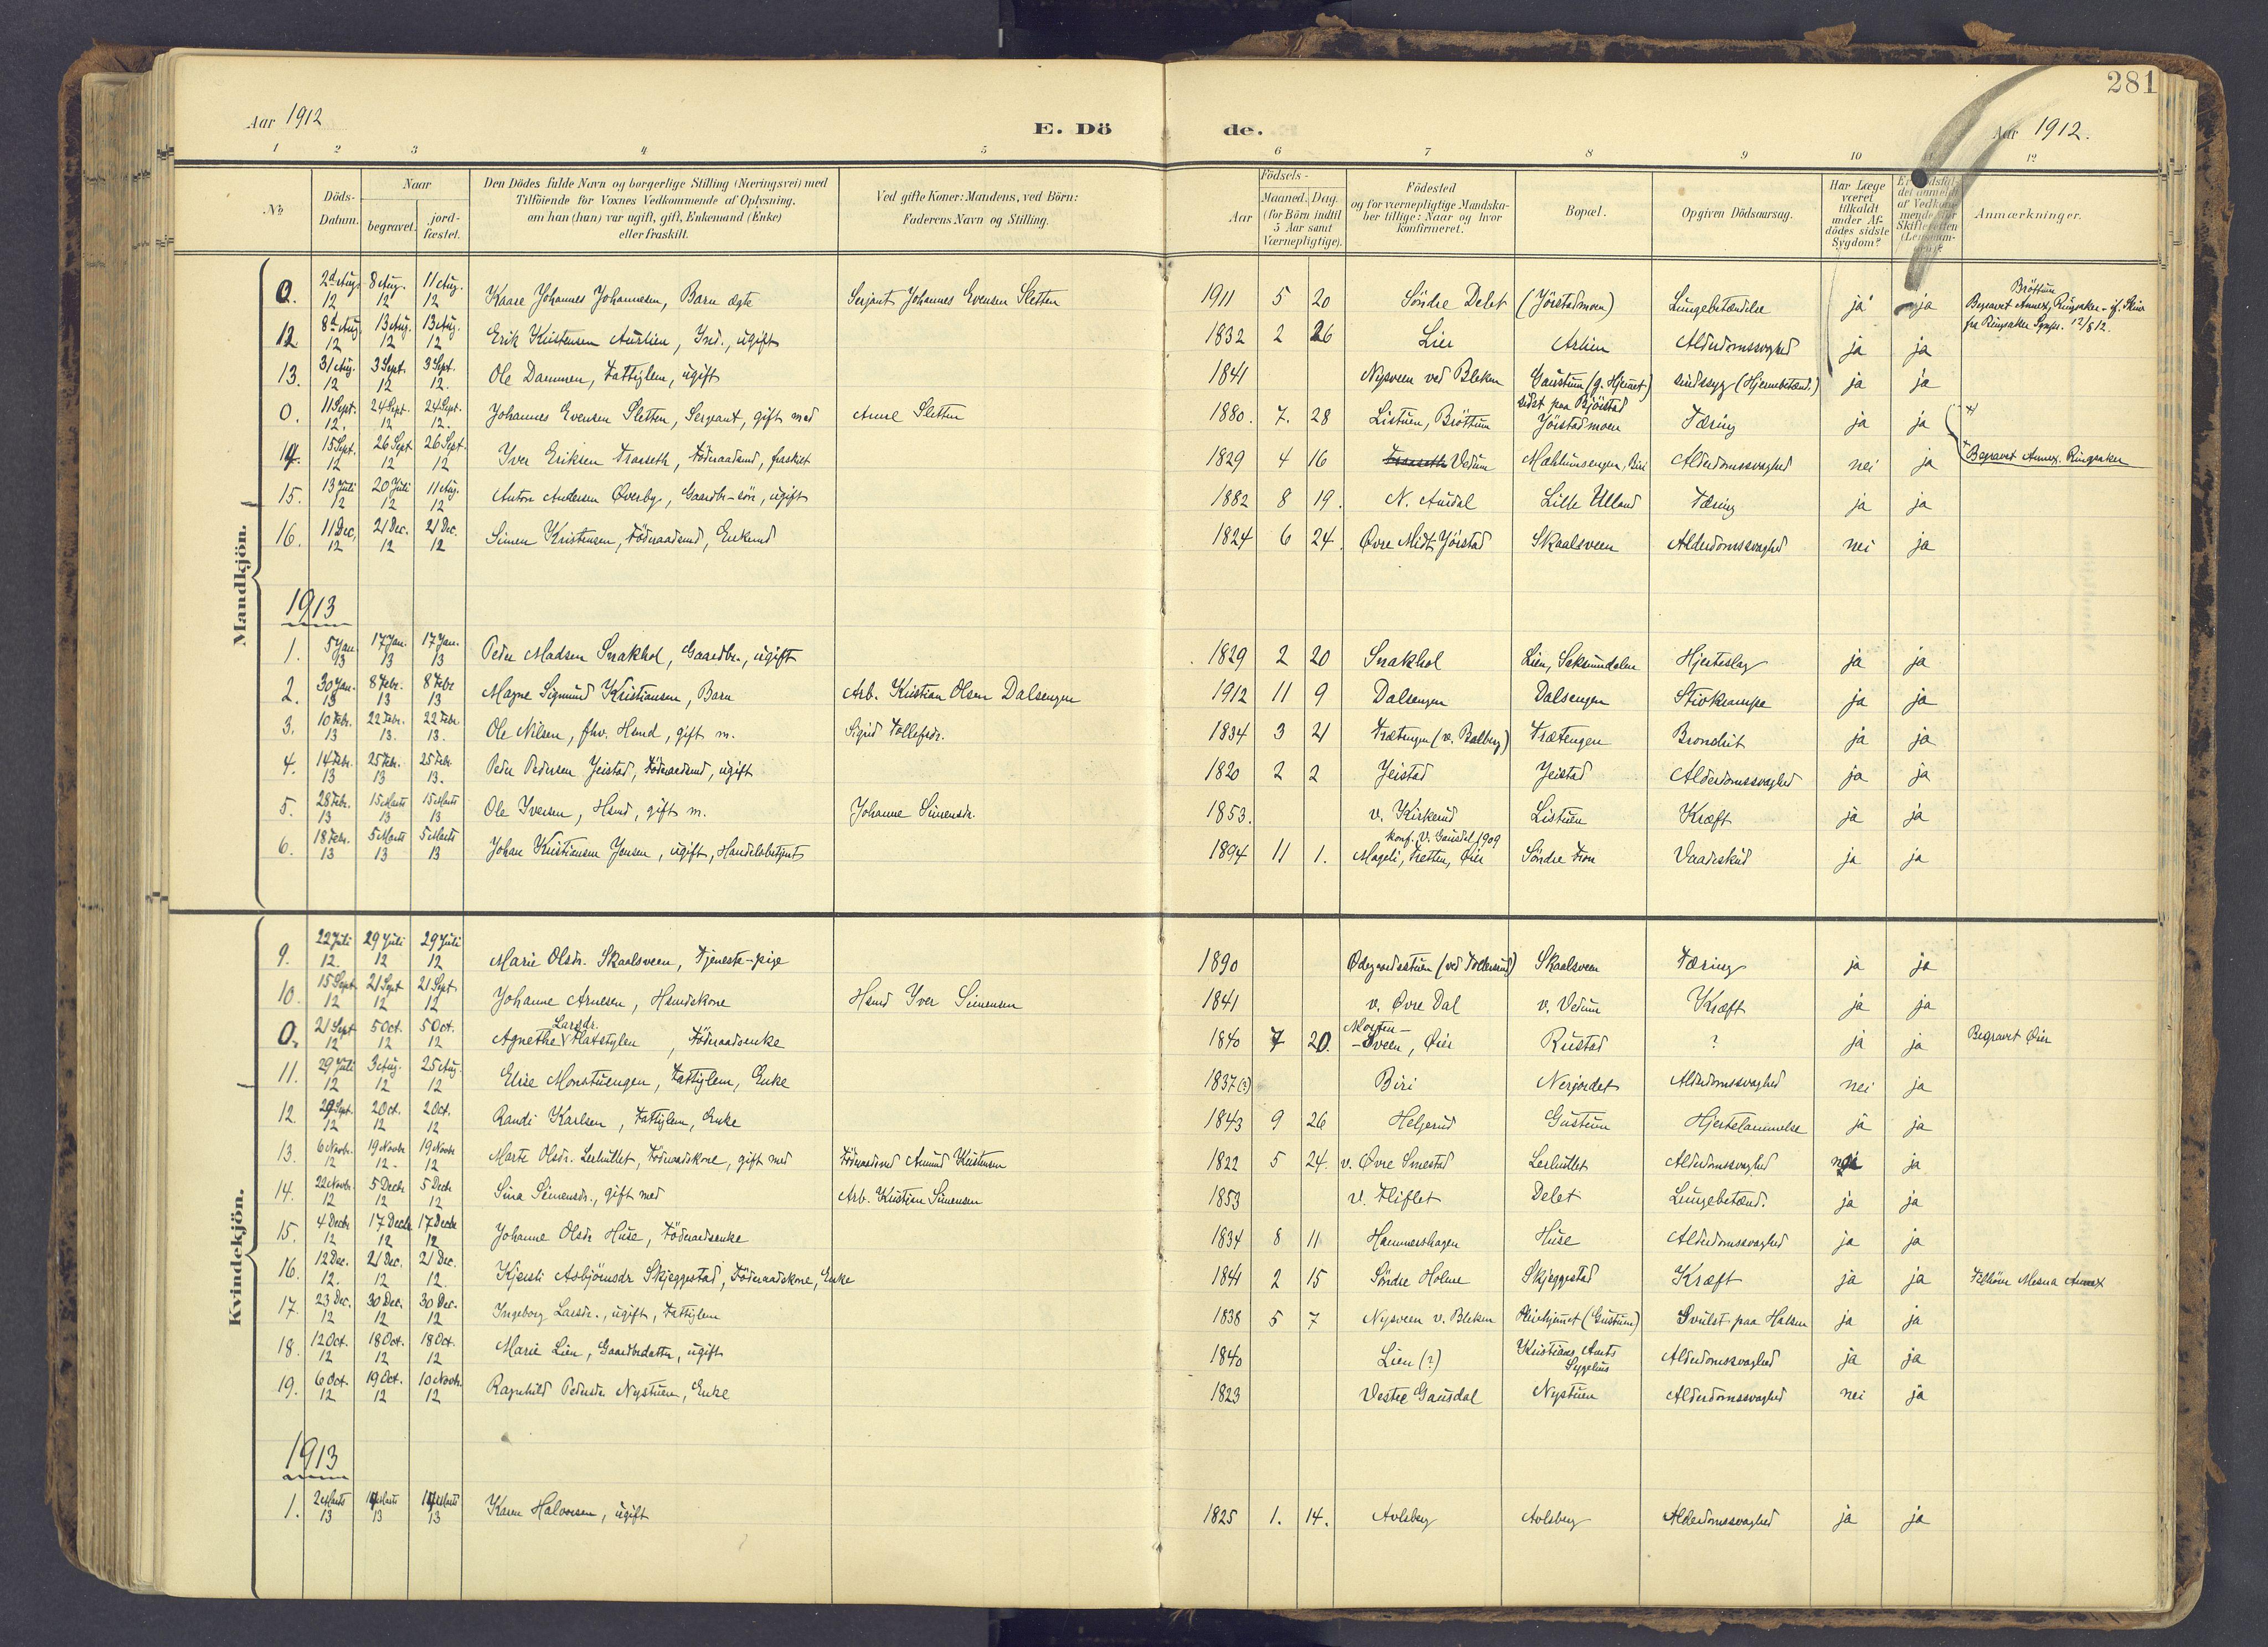 SAH, Fåberg prestekontor, Ministerialbok nr. 12, 1899-1915, s. 281